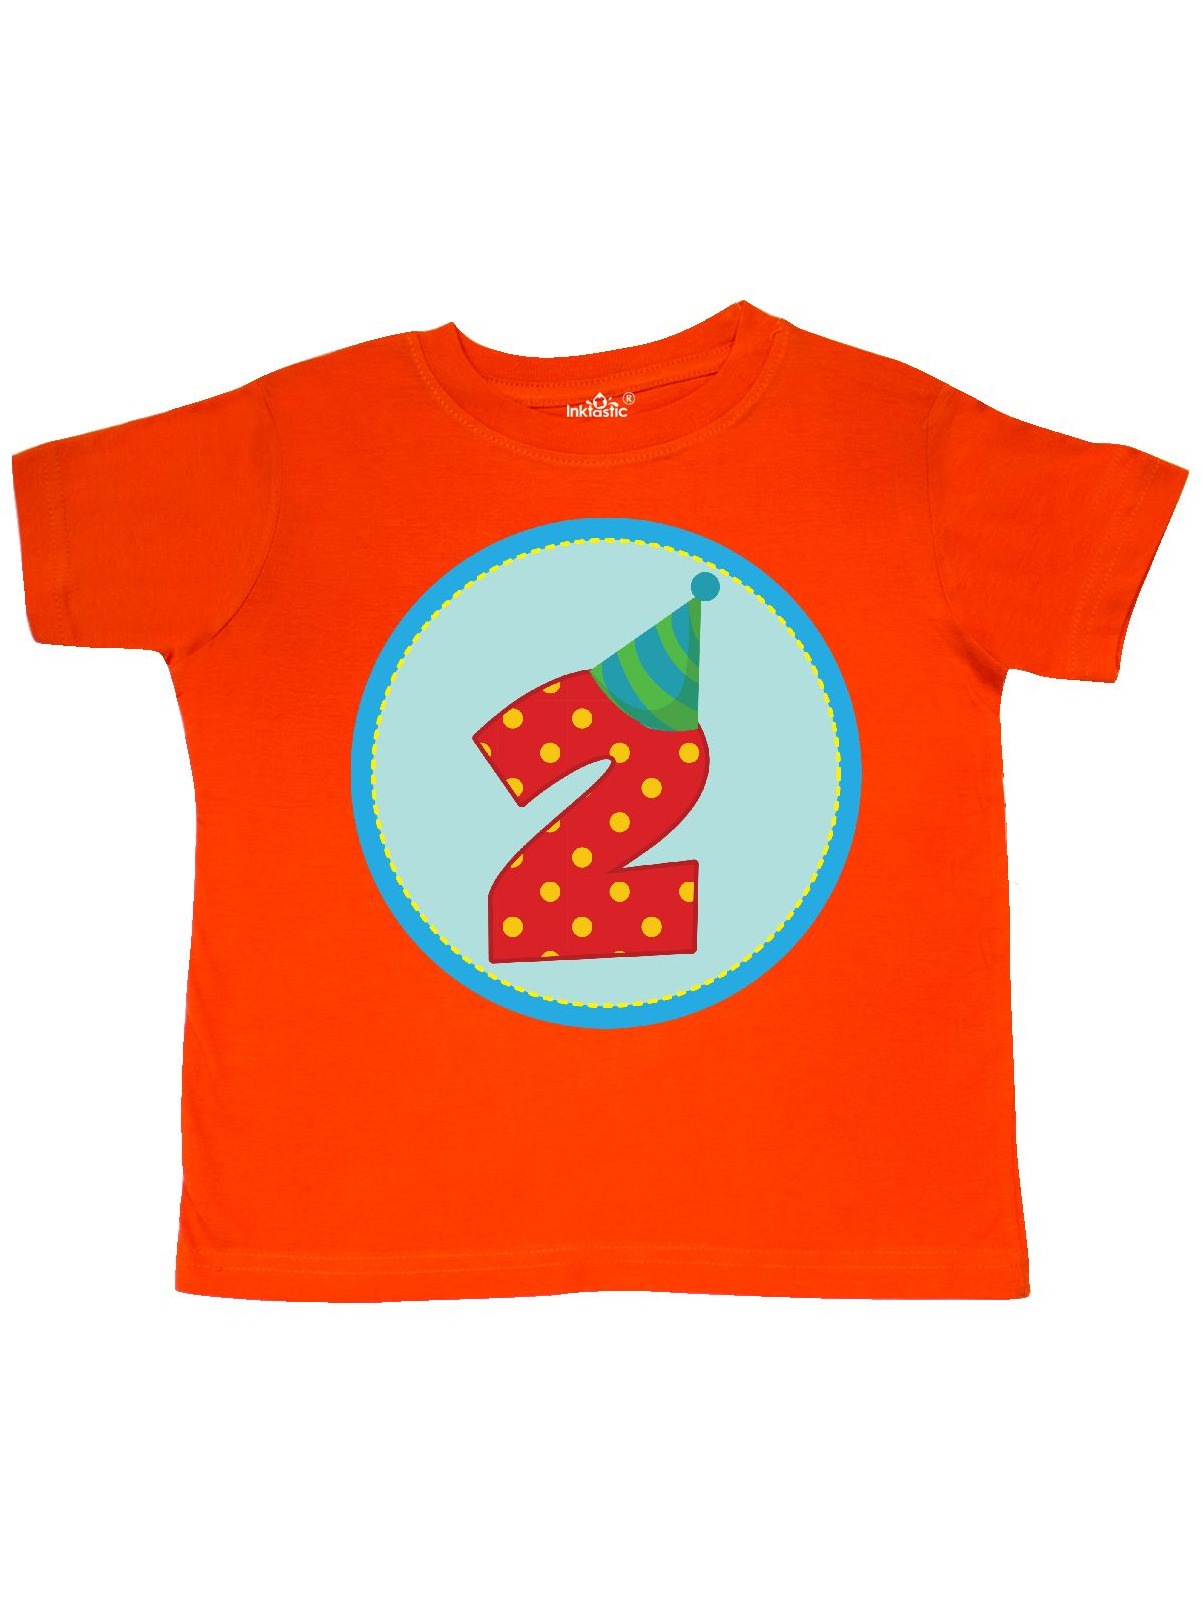 2nd Birthday Boy Toddler T-Shirt